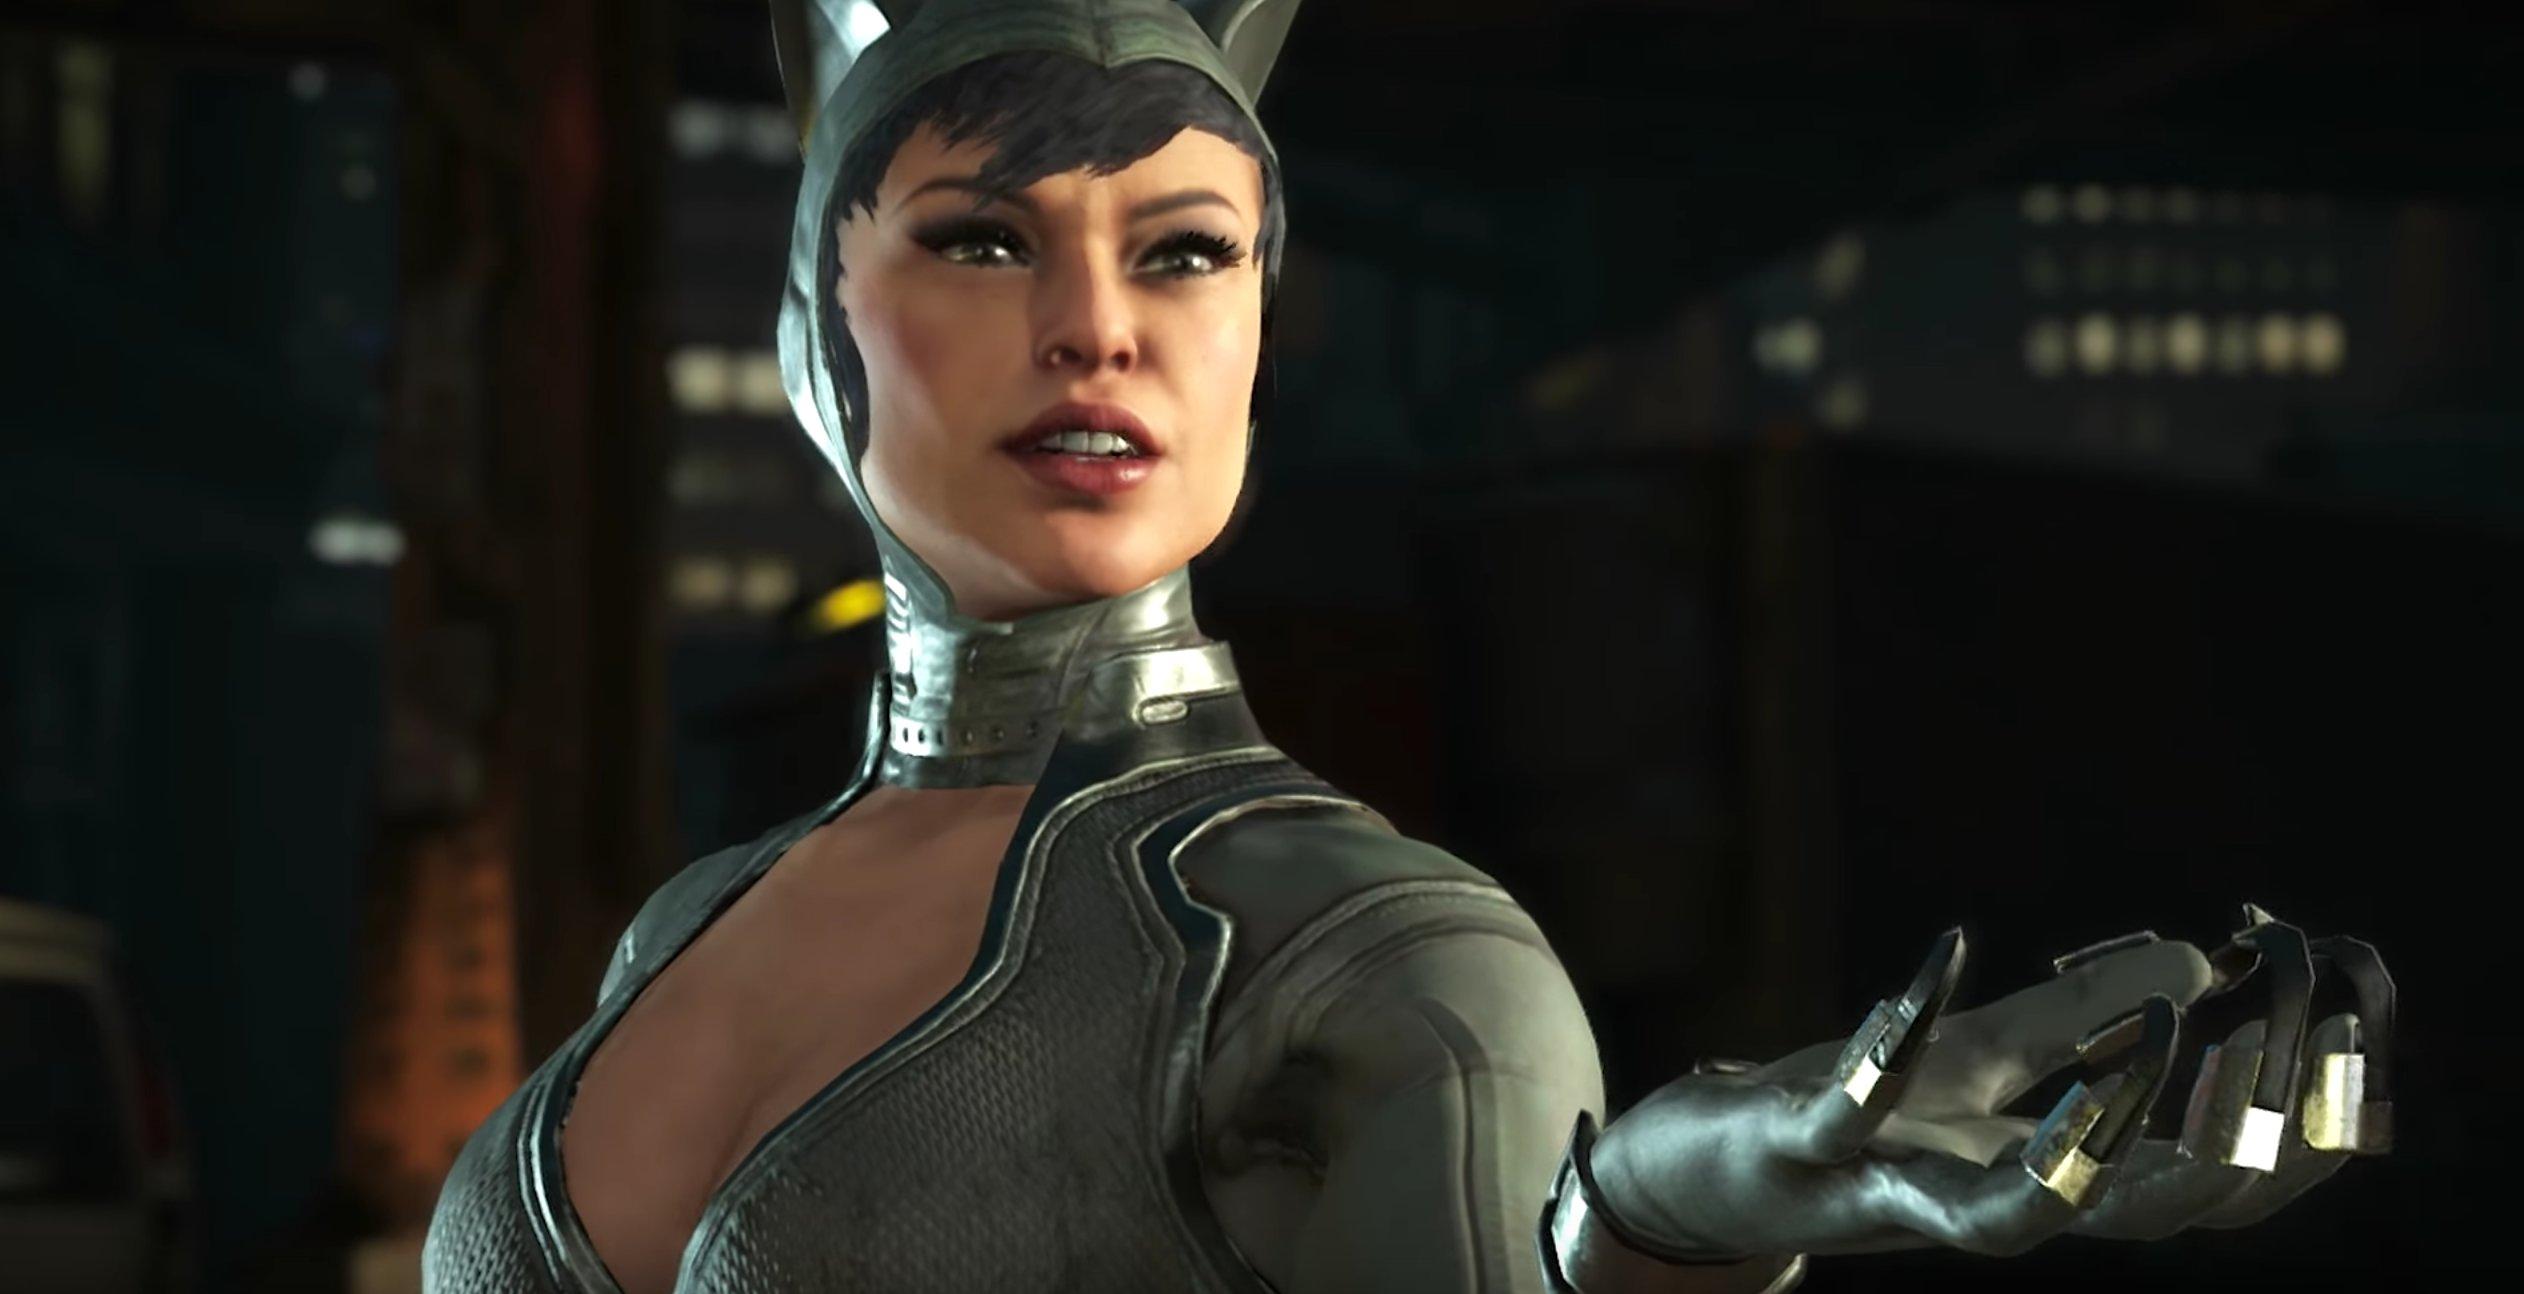 mira-catwoman-nuevo-trailer-injustice-2-frikigamers.com